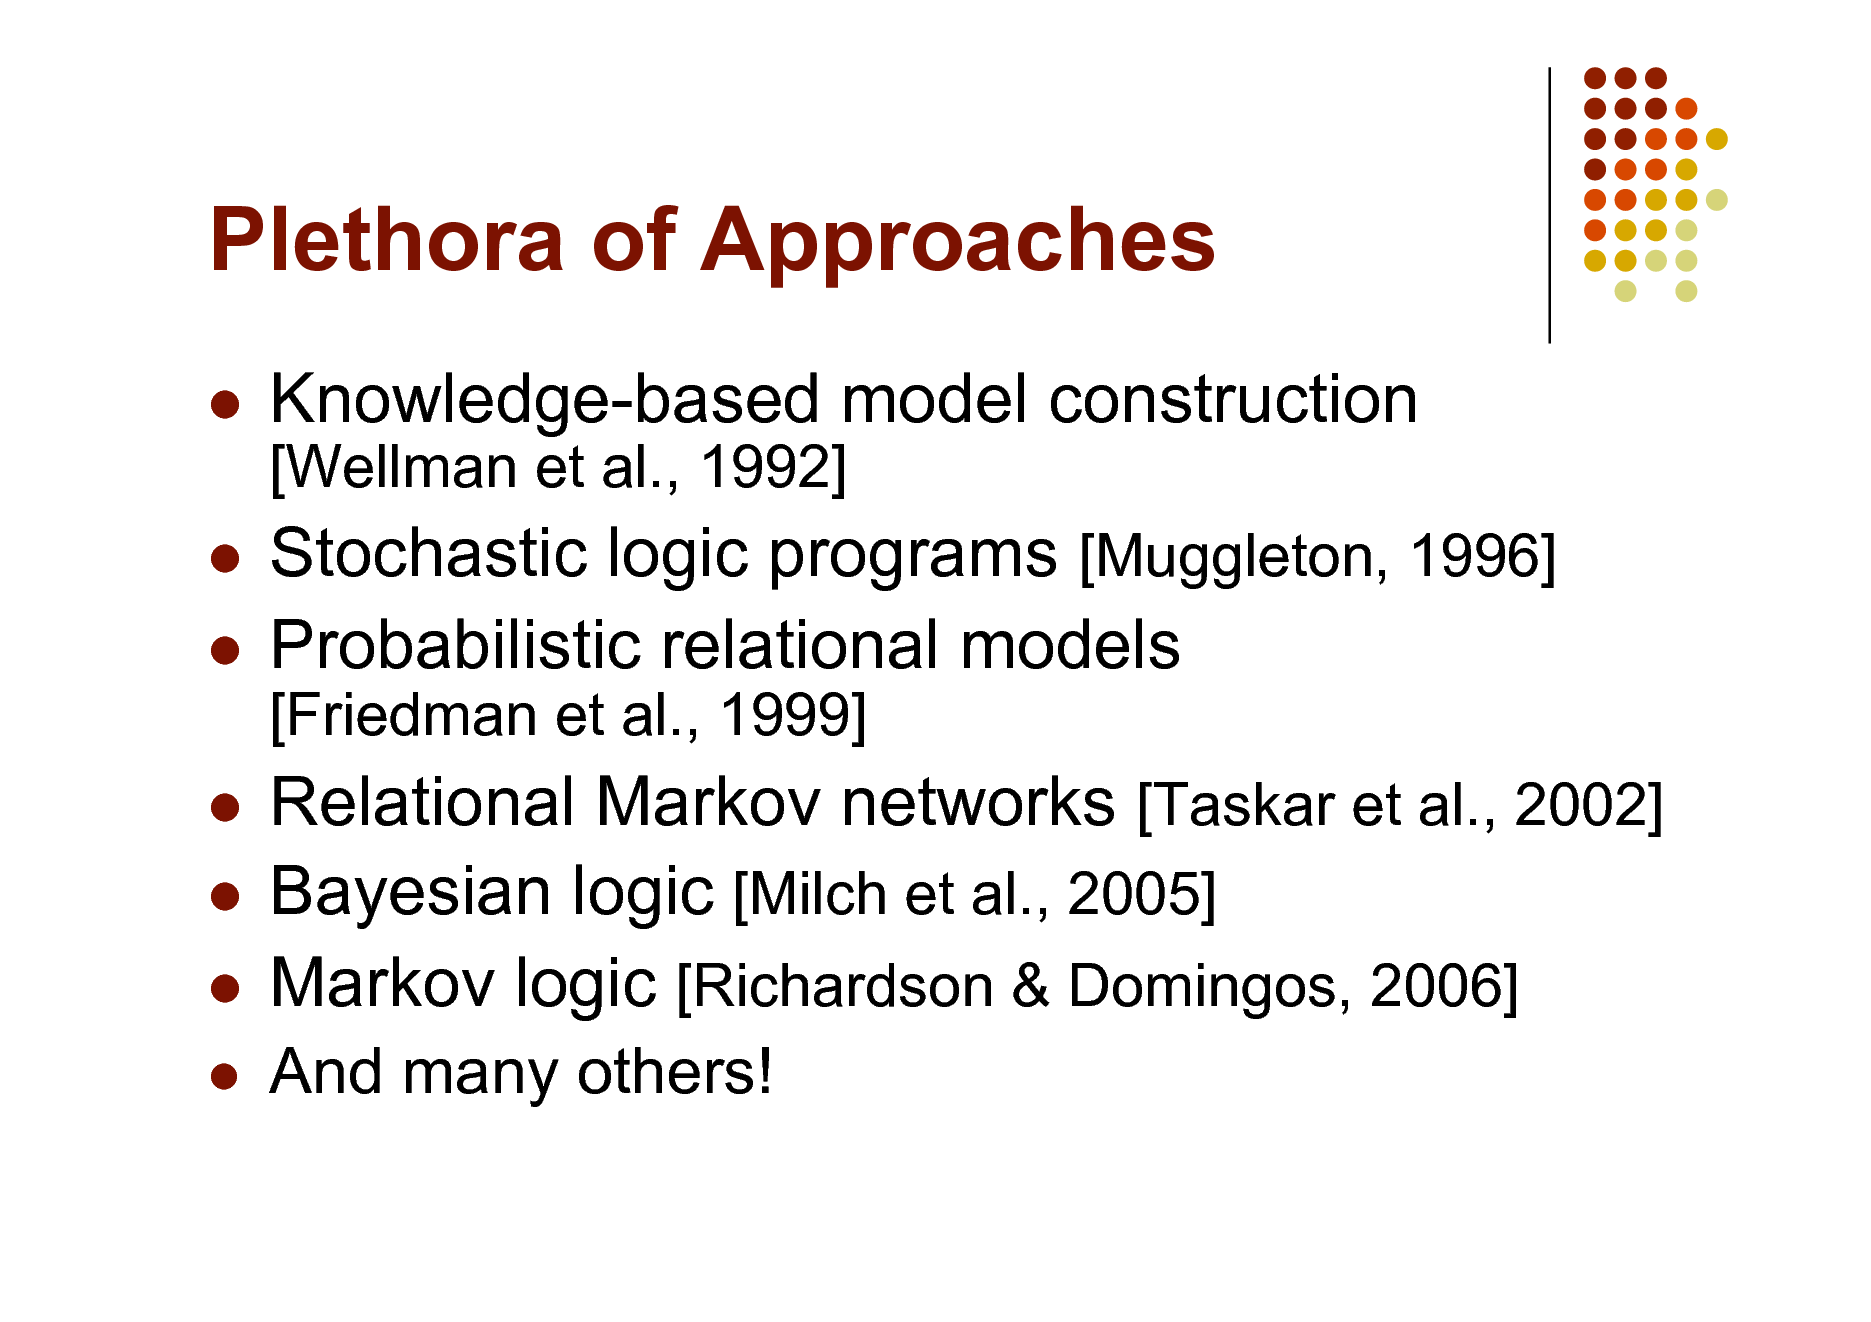 Slide: Plethora of Approaches    Knowledge-based model construction [Wellman et al., 1992]  Stochastic logic programs [Muggleton, 1996]  Probabilistic relational models [Friedman et al., 1999]  Relational Markov networks [Taskar et al., 2002]  Bayesian logic [Milch et al., 2005]  Markov logic [Richardson & Domingos, 2006]    And many others!